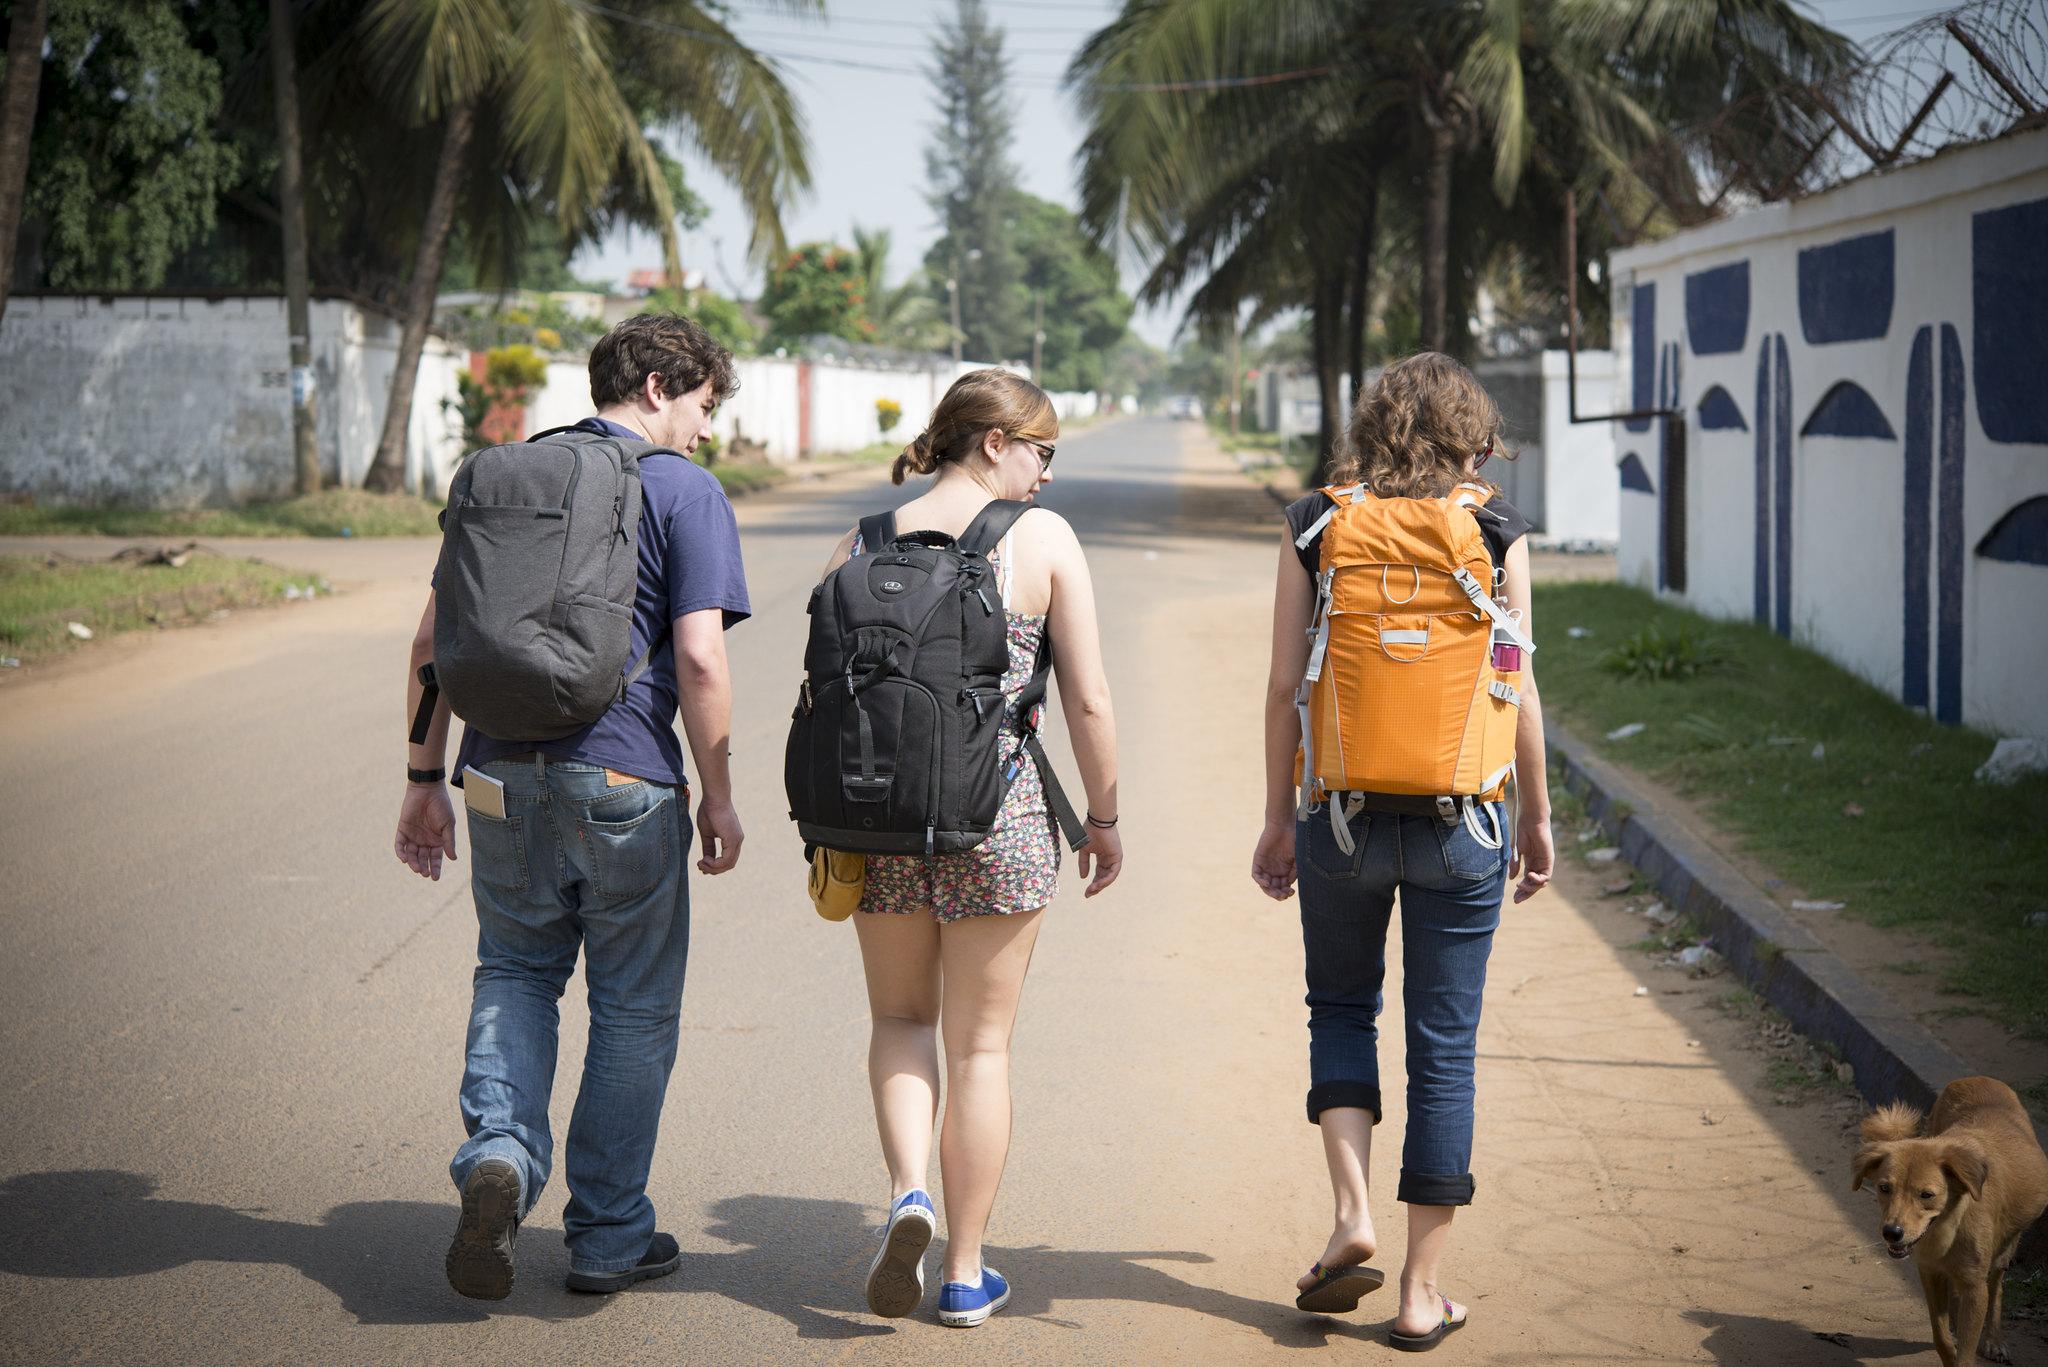 MPD Graduate students Jim Tuttle, Kristina Subsara, Jessica Suarez taking their first walk on the streets of Monrovia, Liberia.